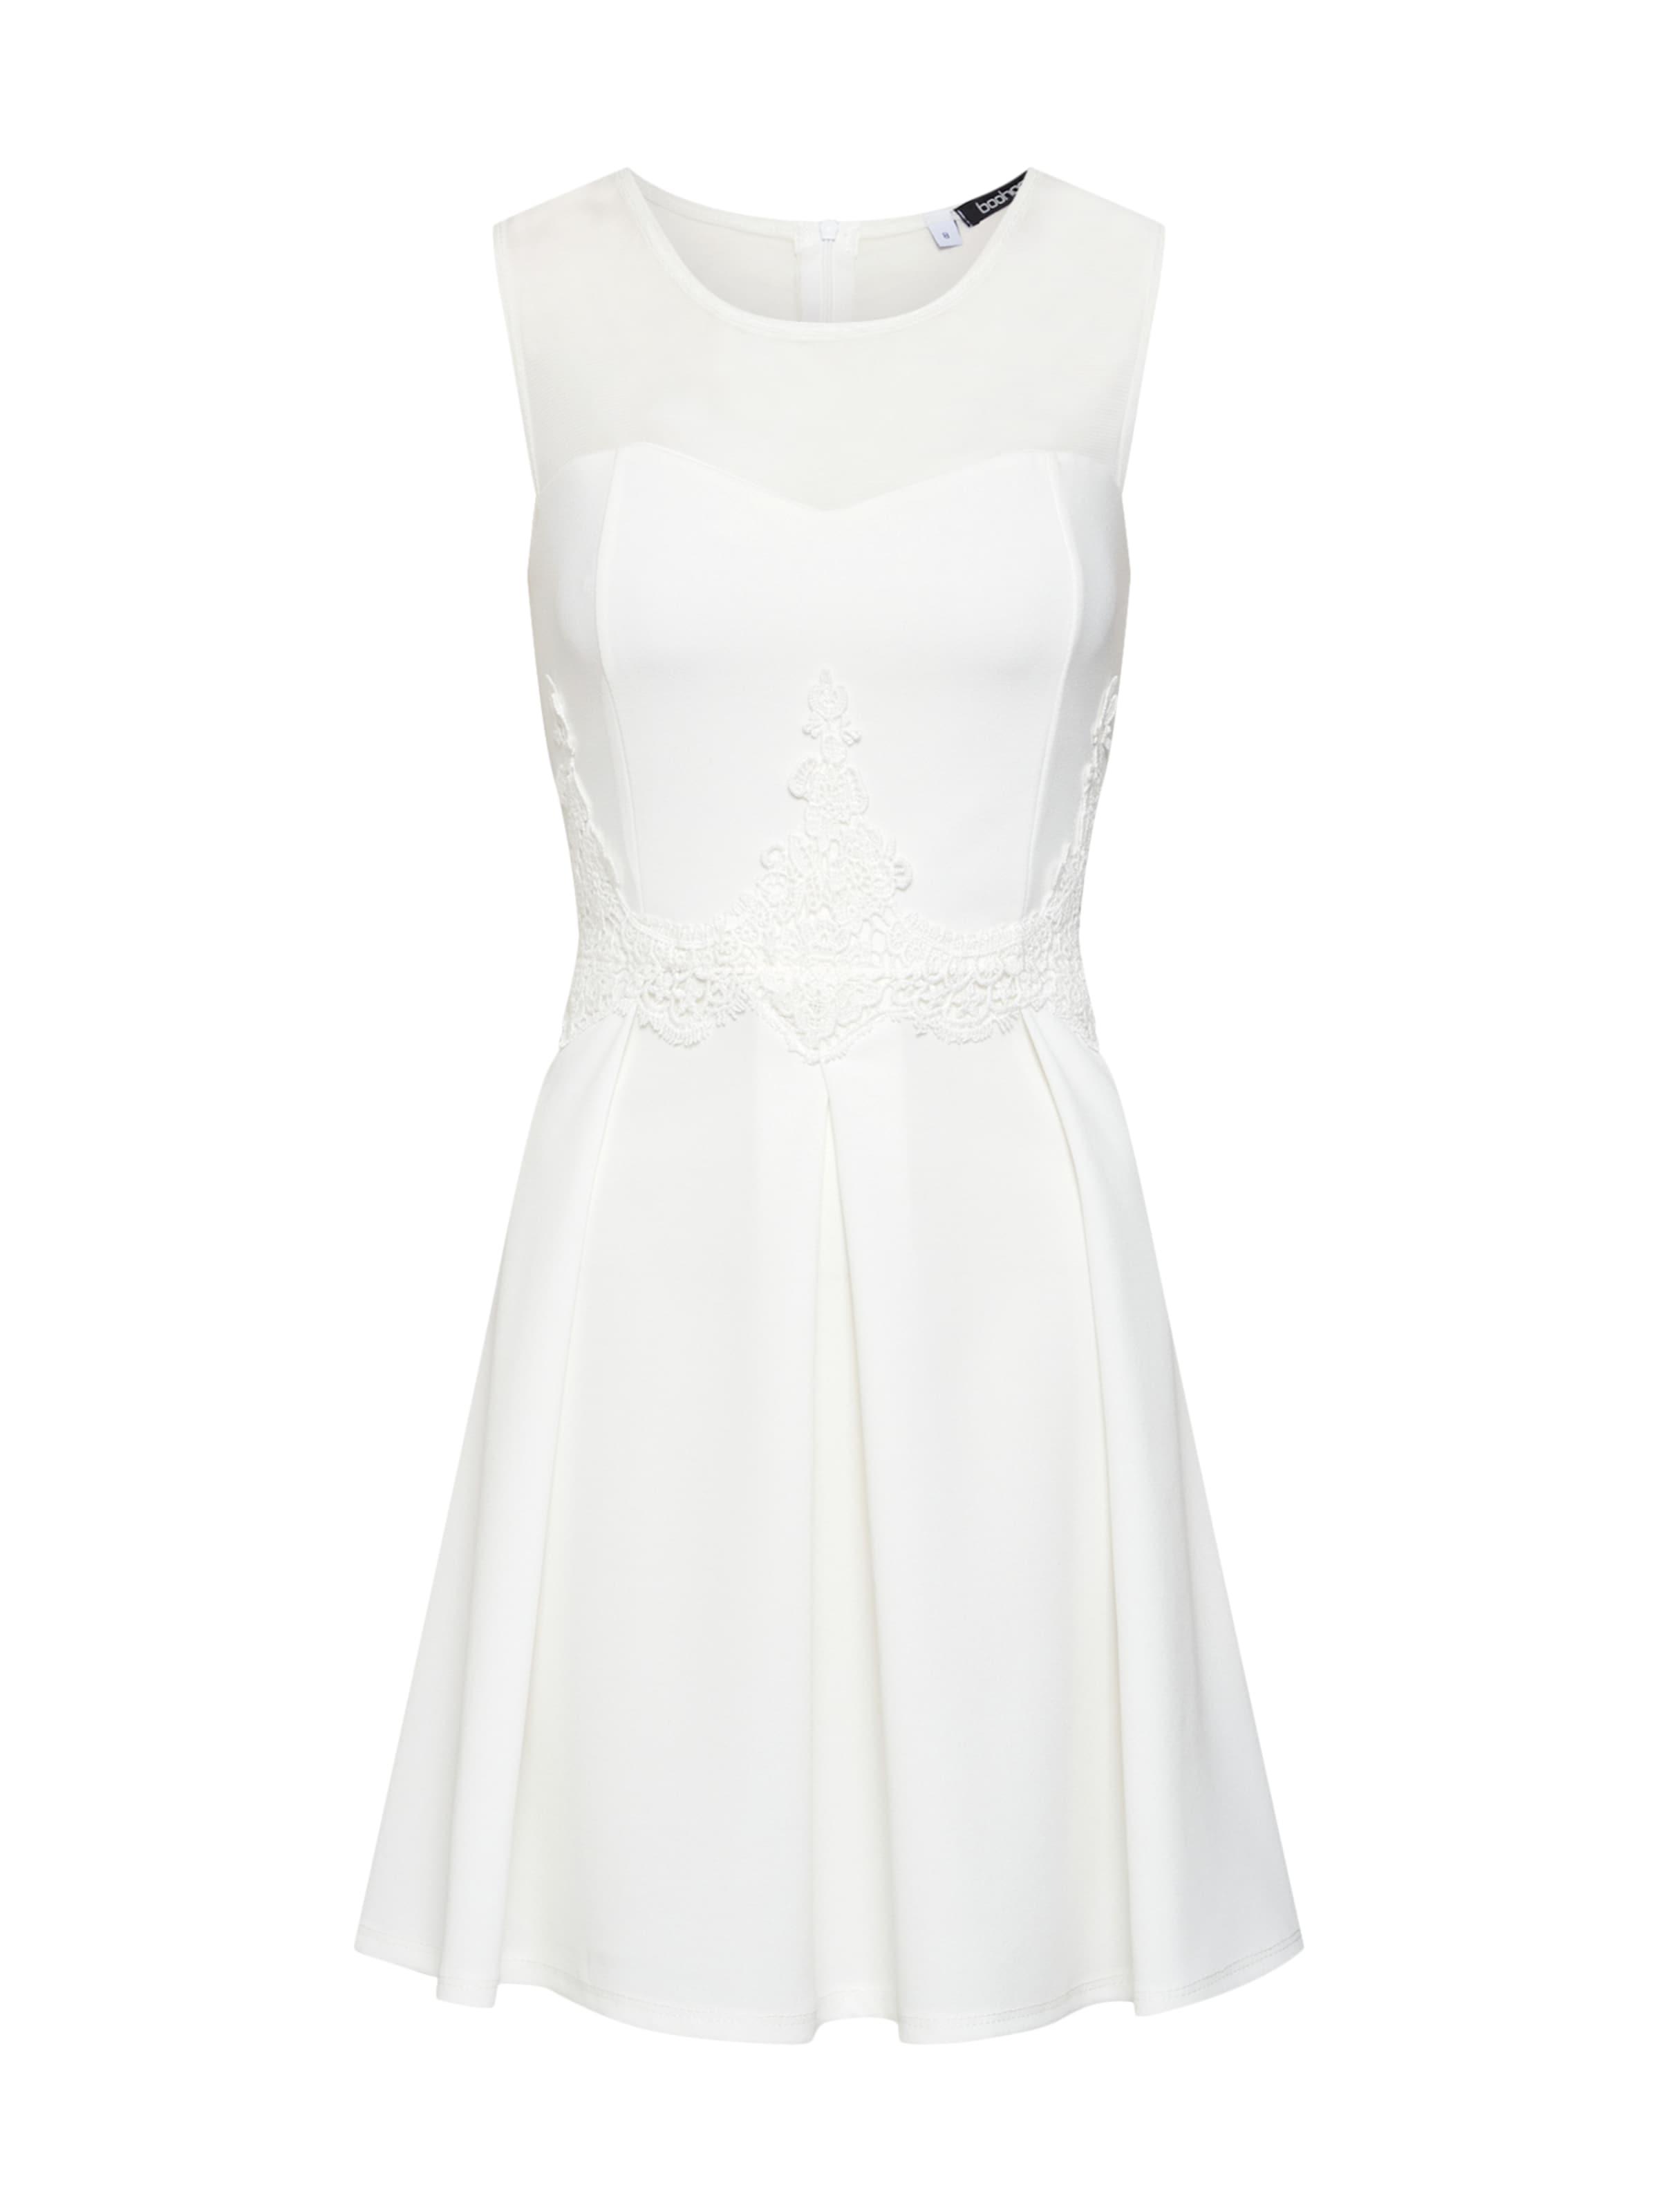 In Kleid Boohoo Boohoo In Weiß In Kleid Boohoo Weiß Kleid Boohoo Weiß 8PXn0wkO